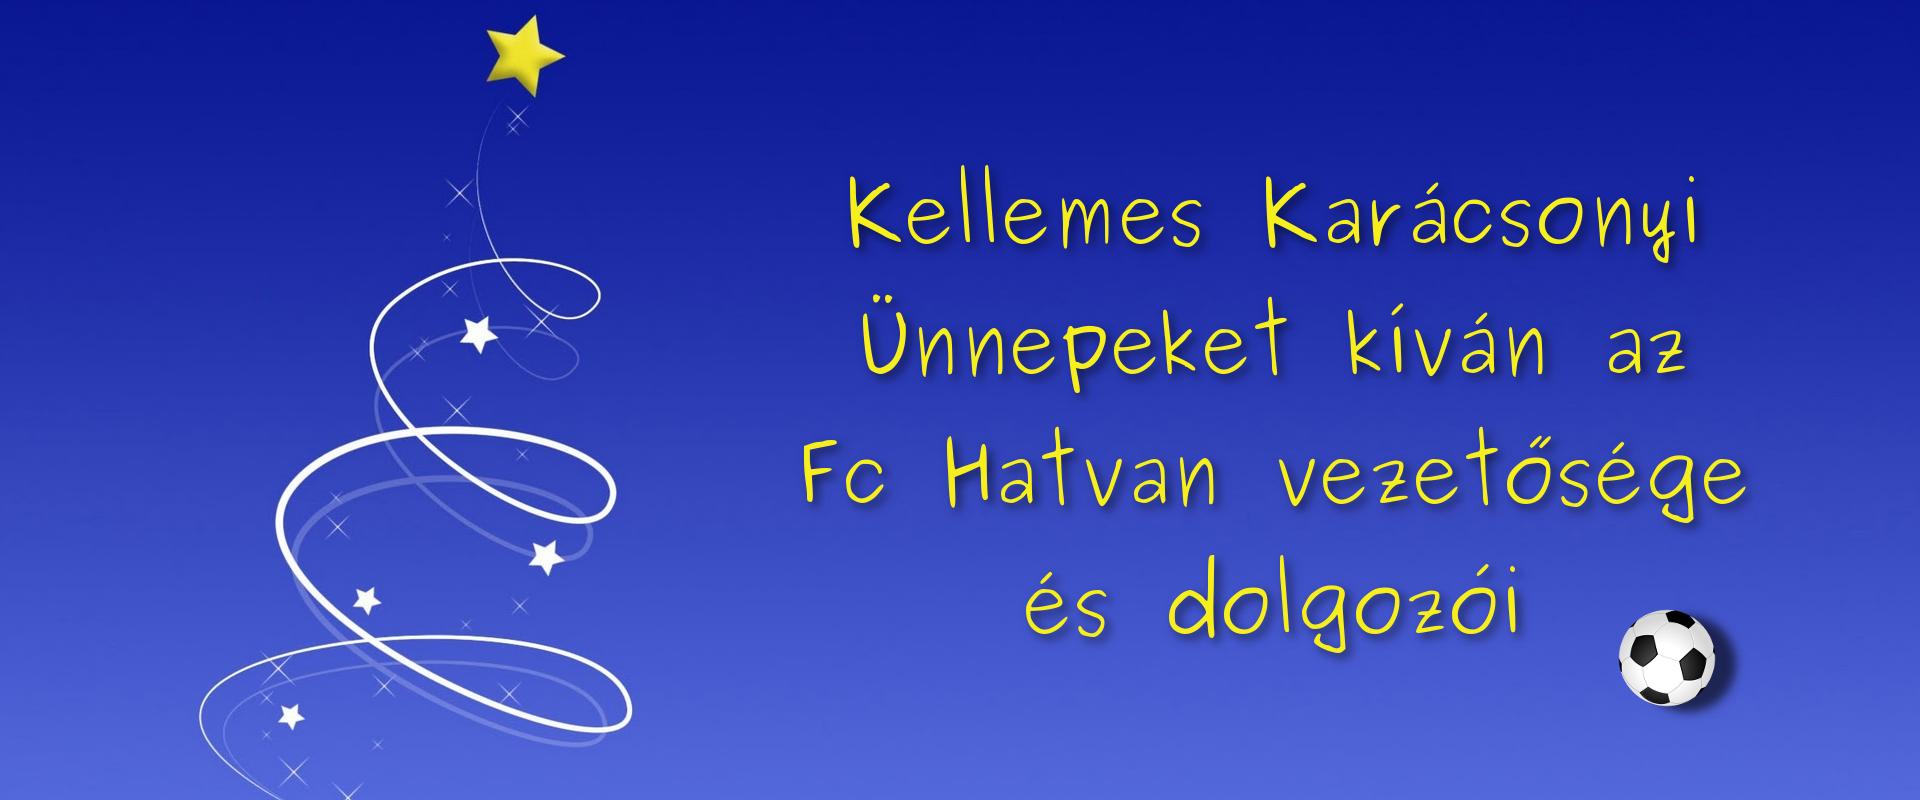 Permalink to: slider_kep1